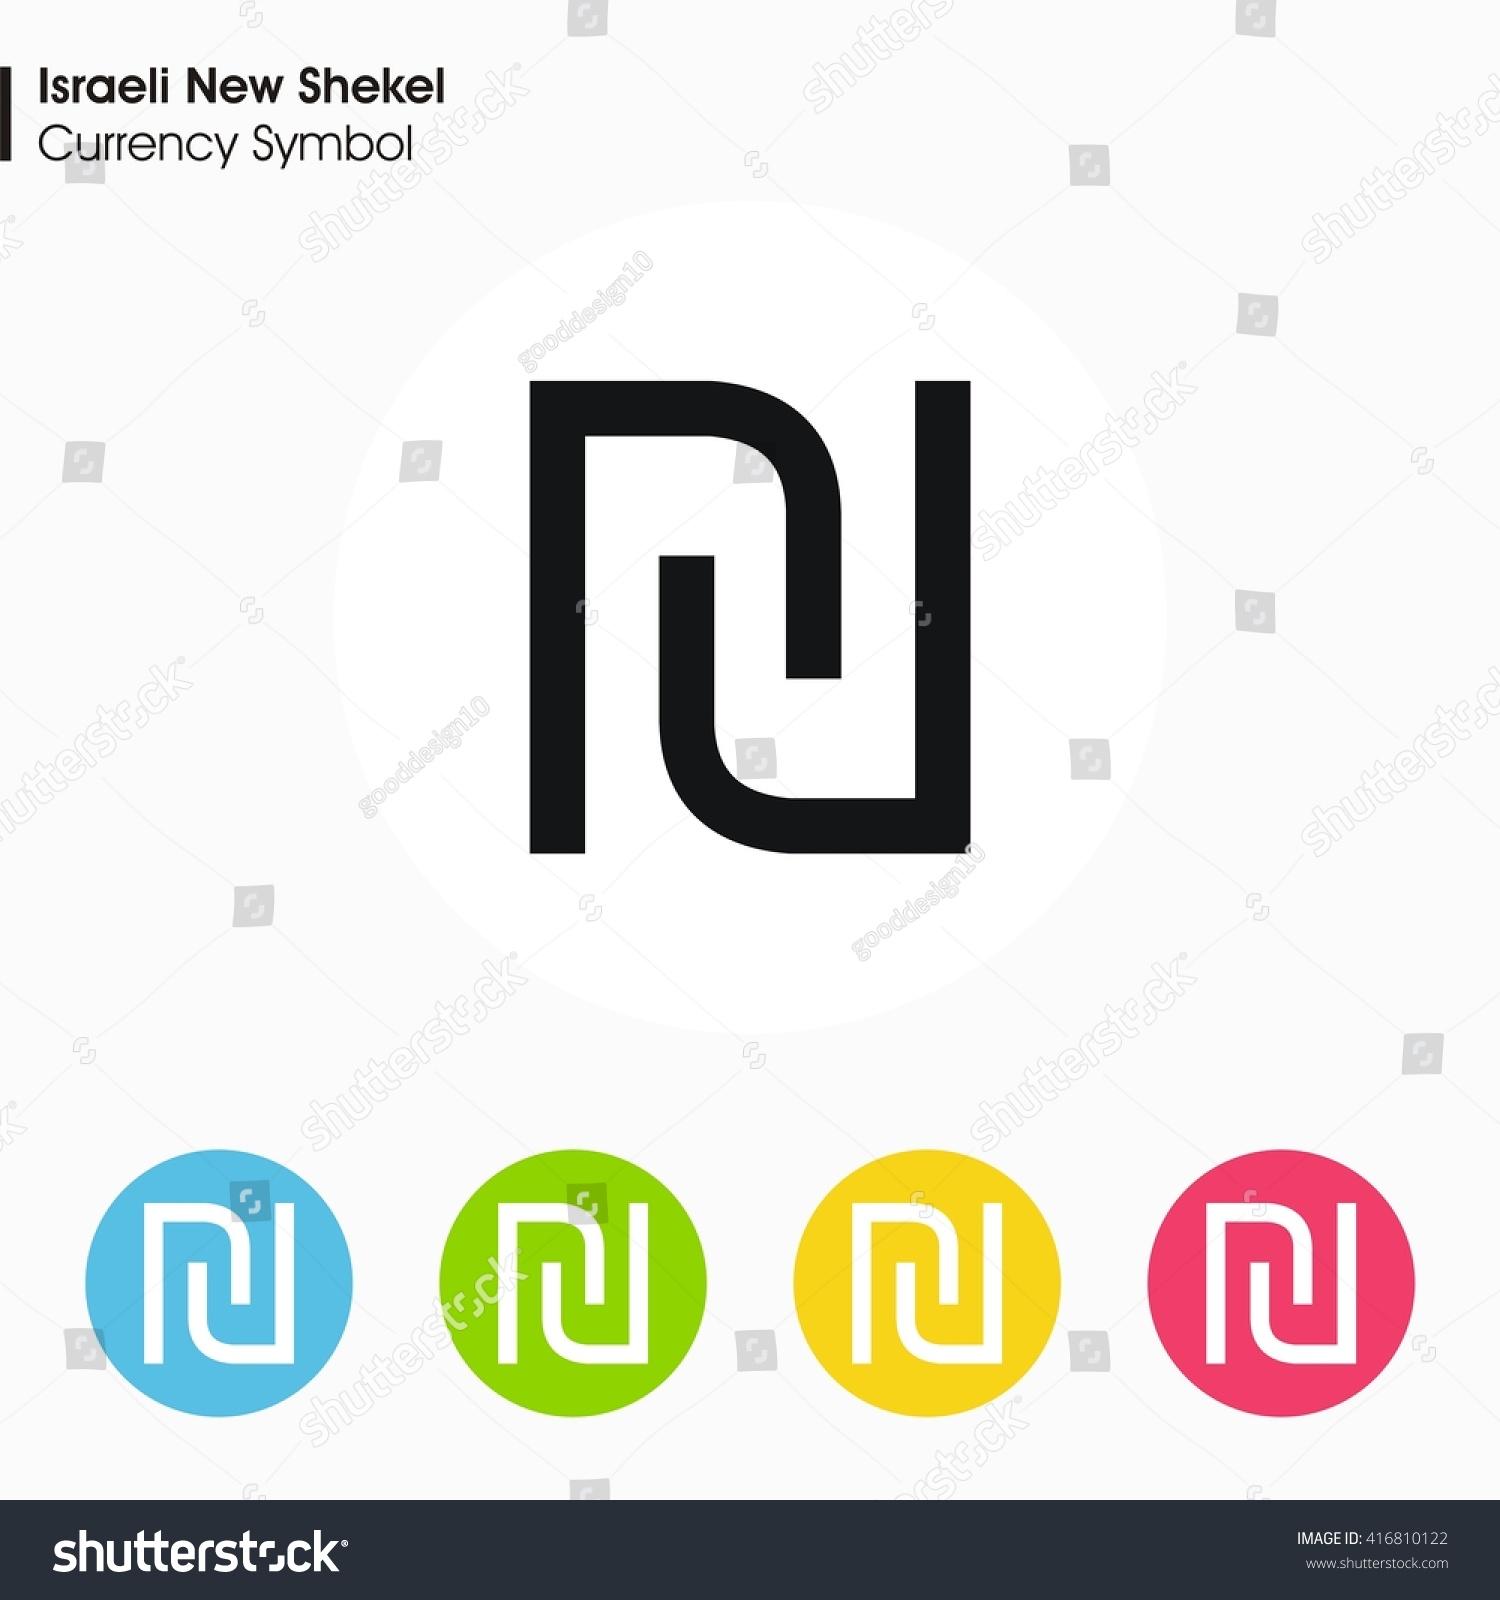 Israeli New Shekel Sign Icon Money Symbol Stock Photo Photo Vector